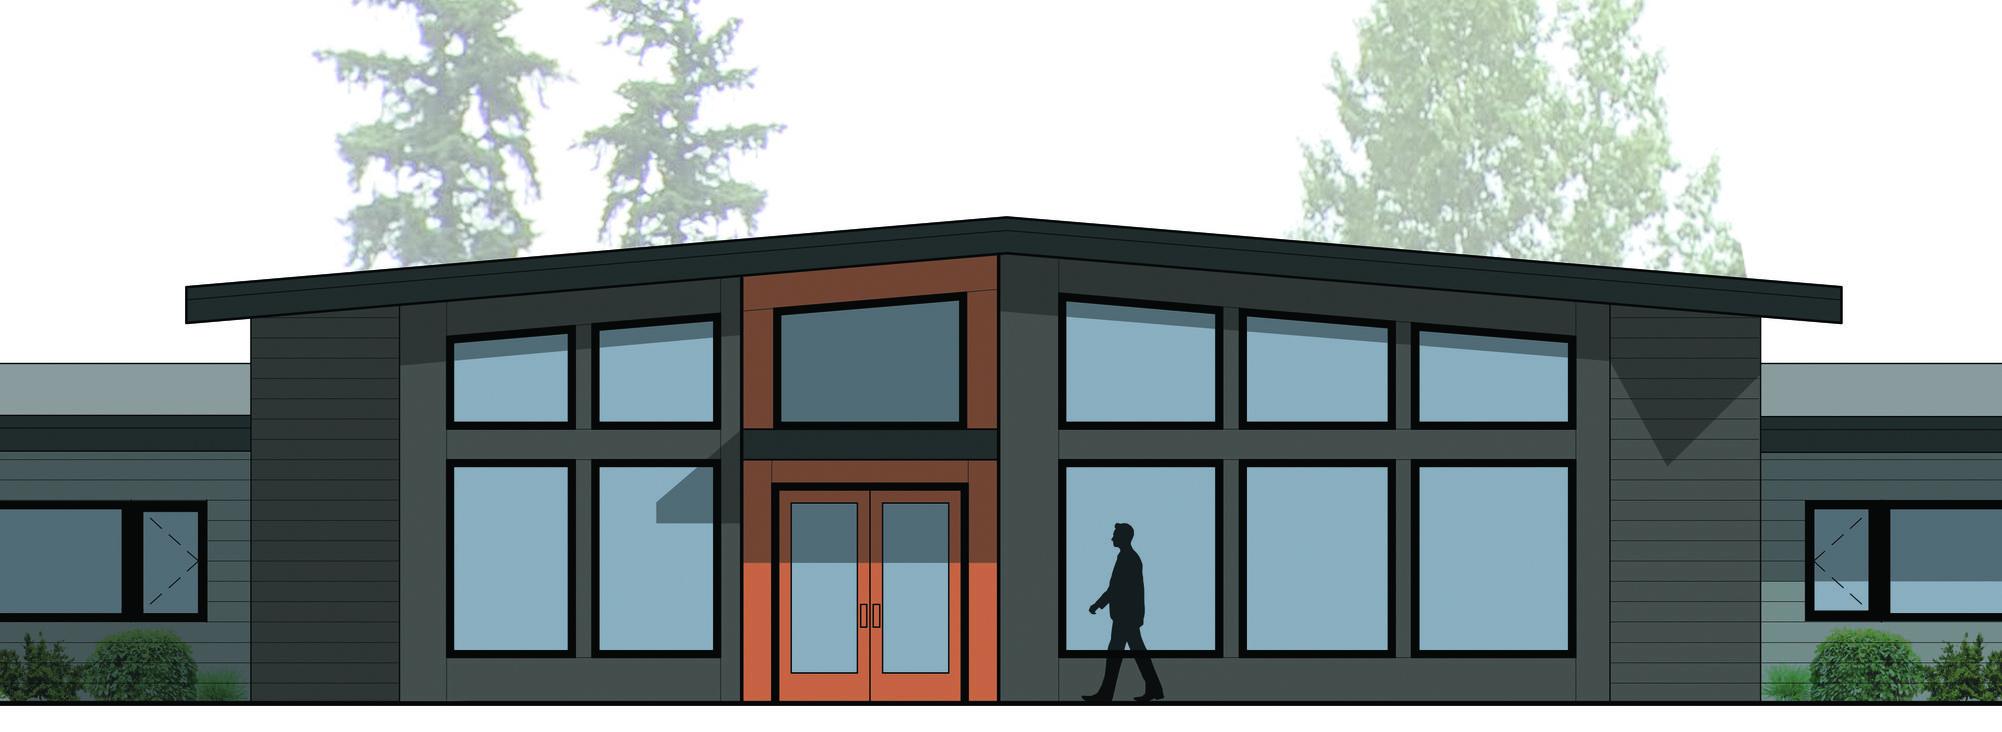 rendering of 18000 Webster Road apartments